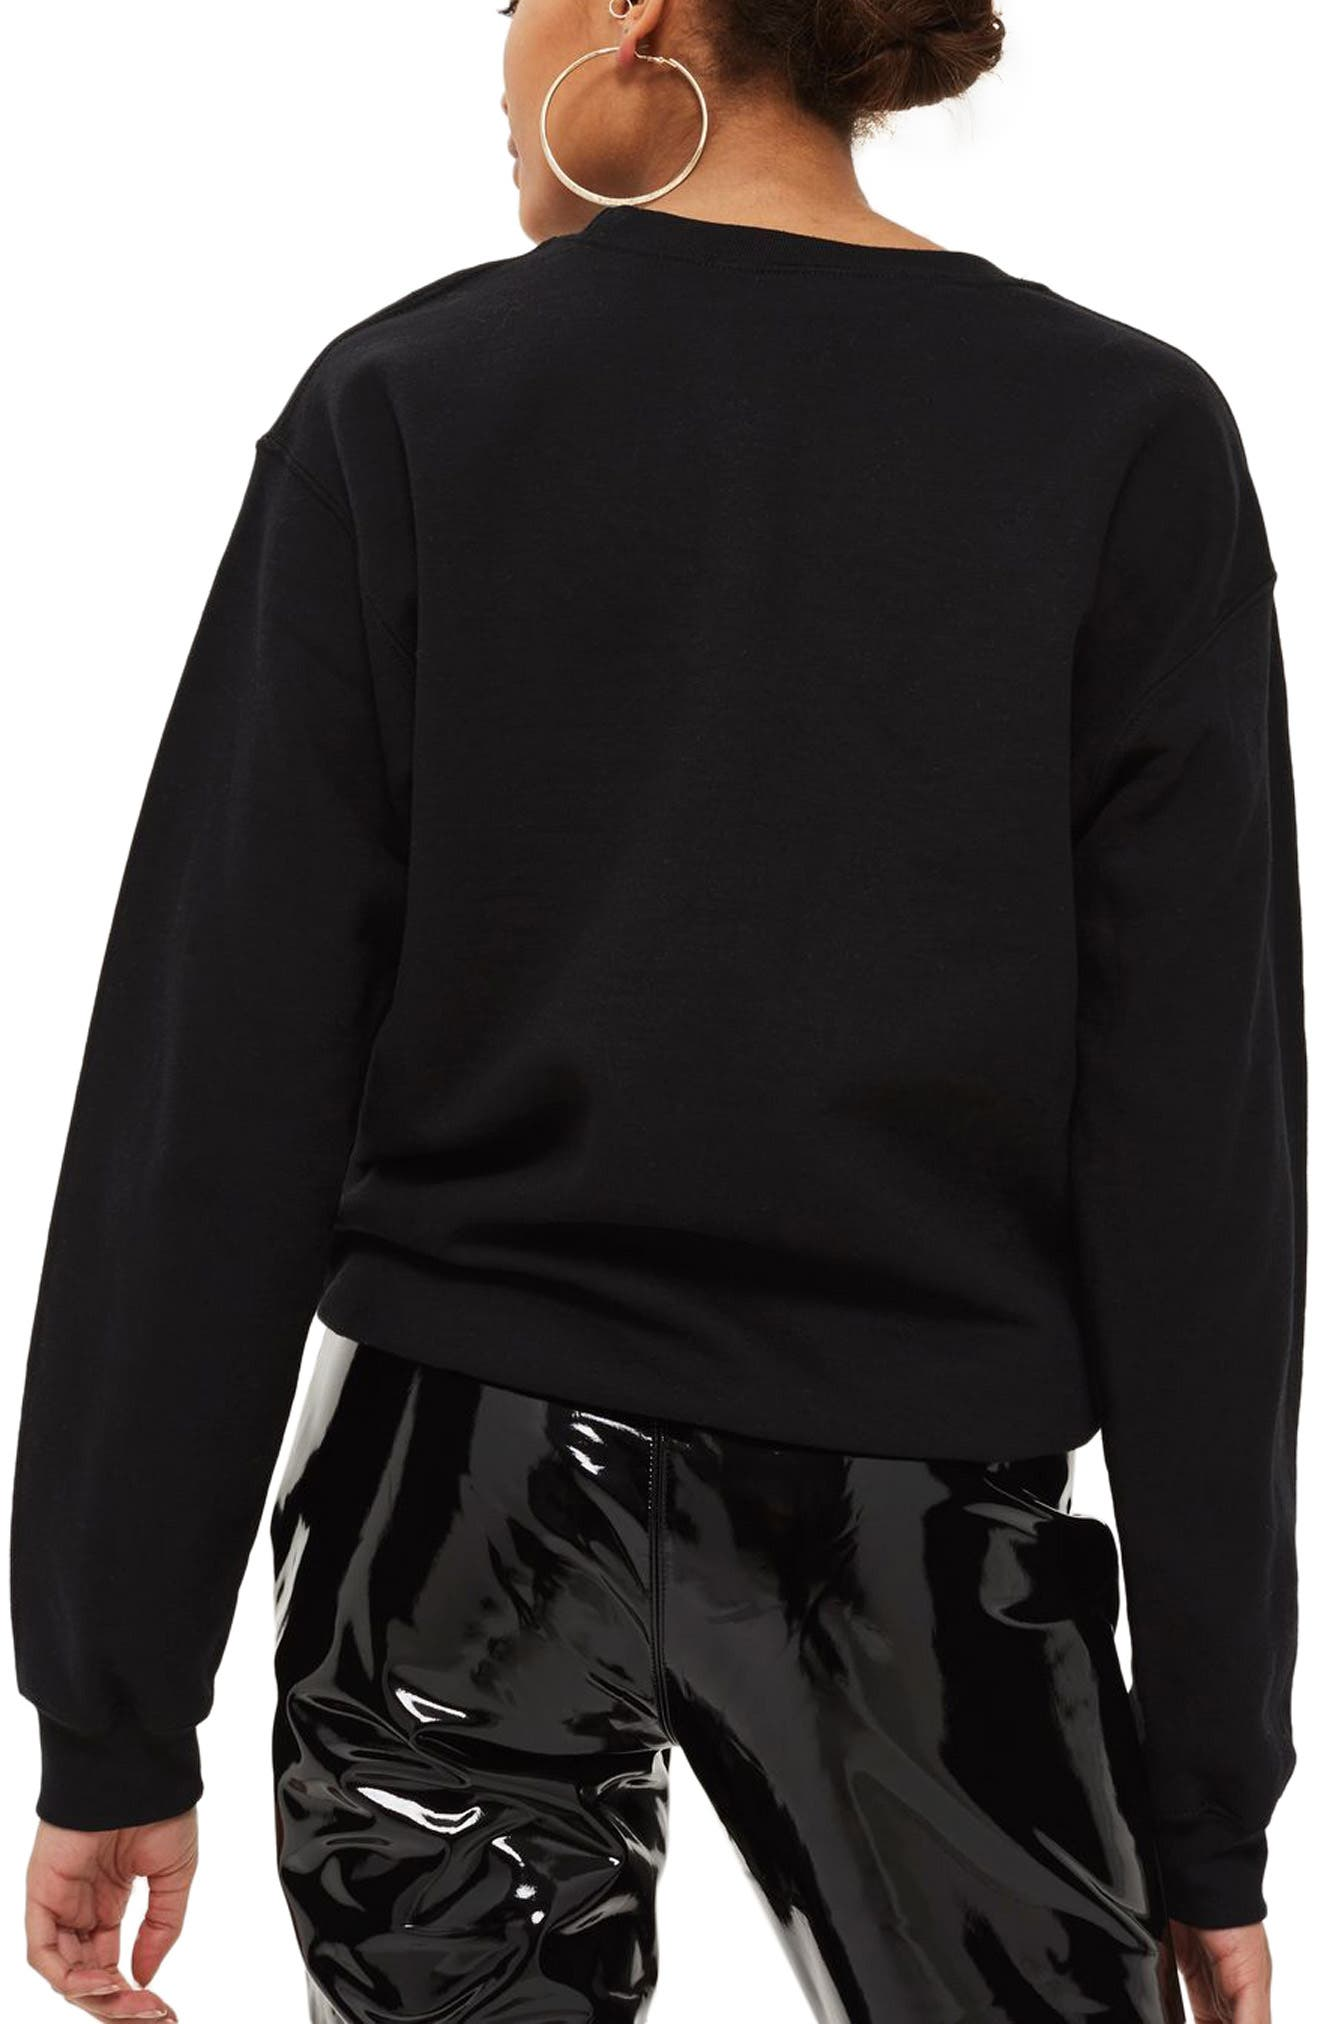 Milan Graphic Sweatshirt,                             Alternate thumbnail 2, color,                             Black Multi